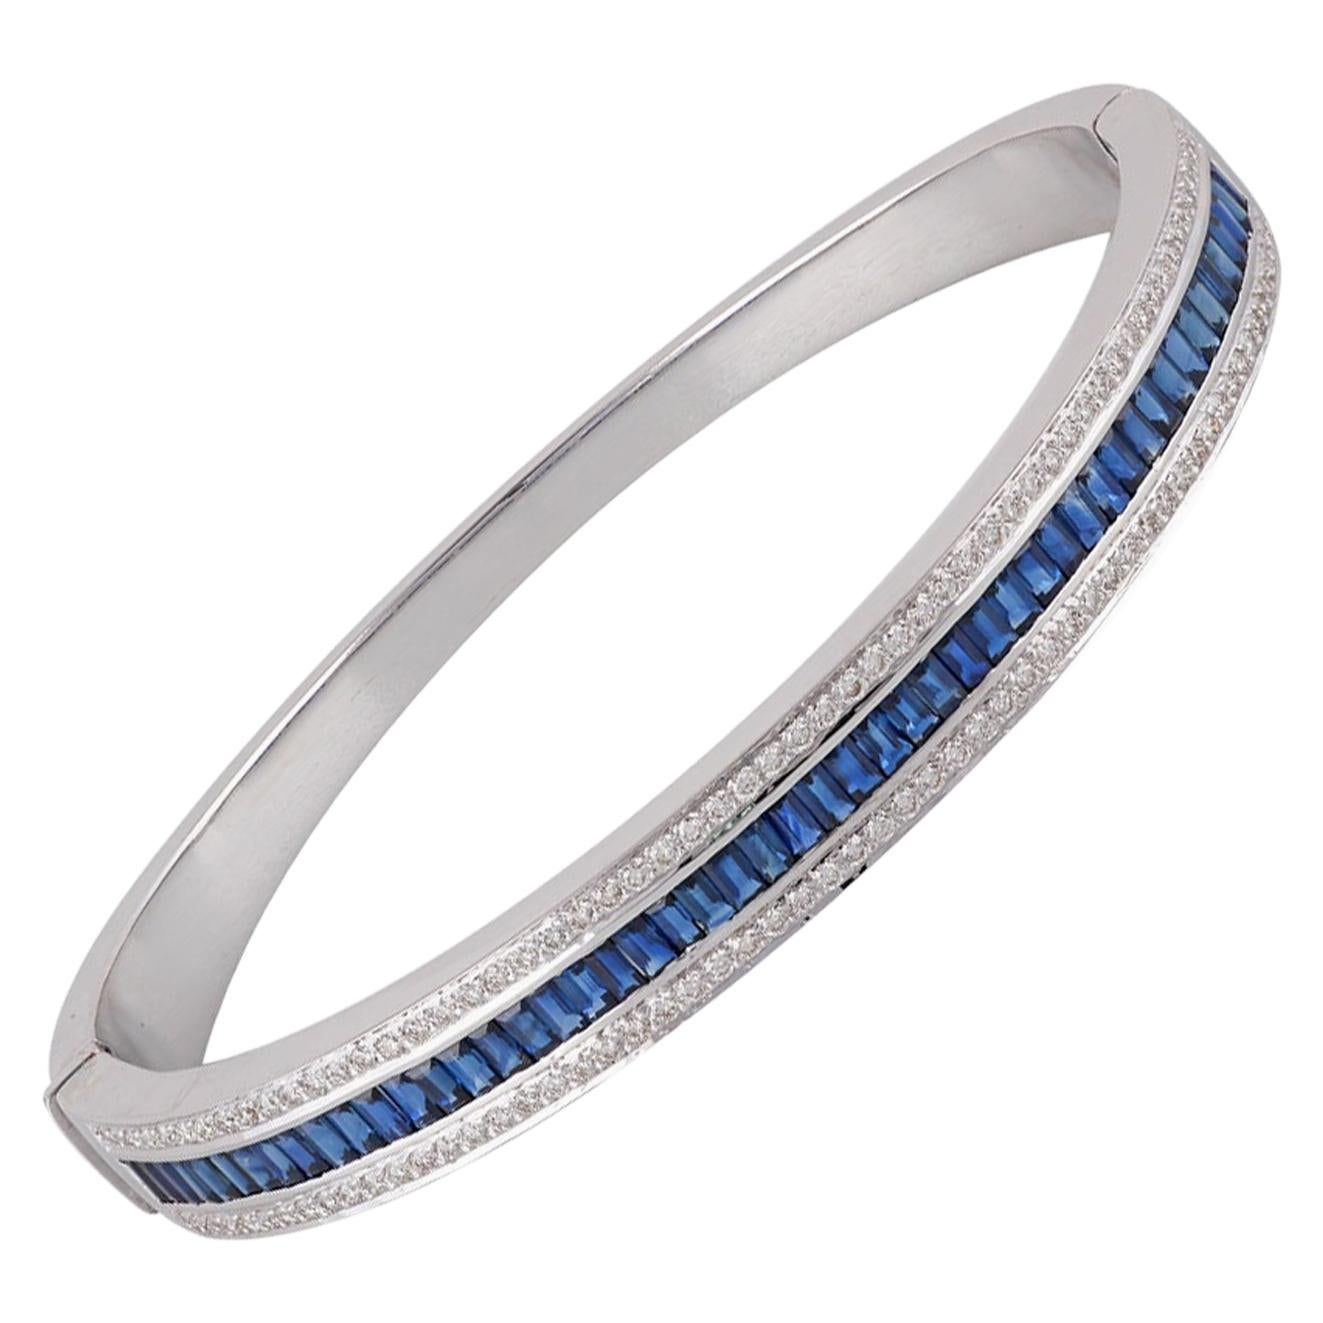 Blue Sapphire and Diamond Bangle Studded in 18 Karat White Gold